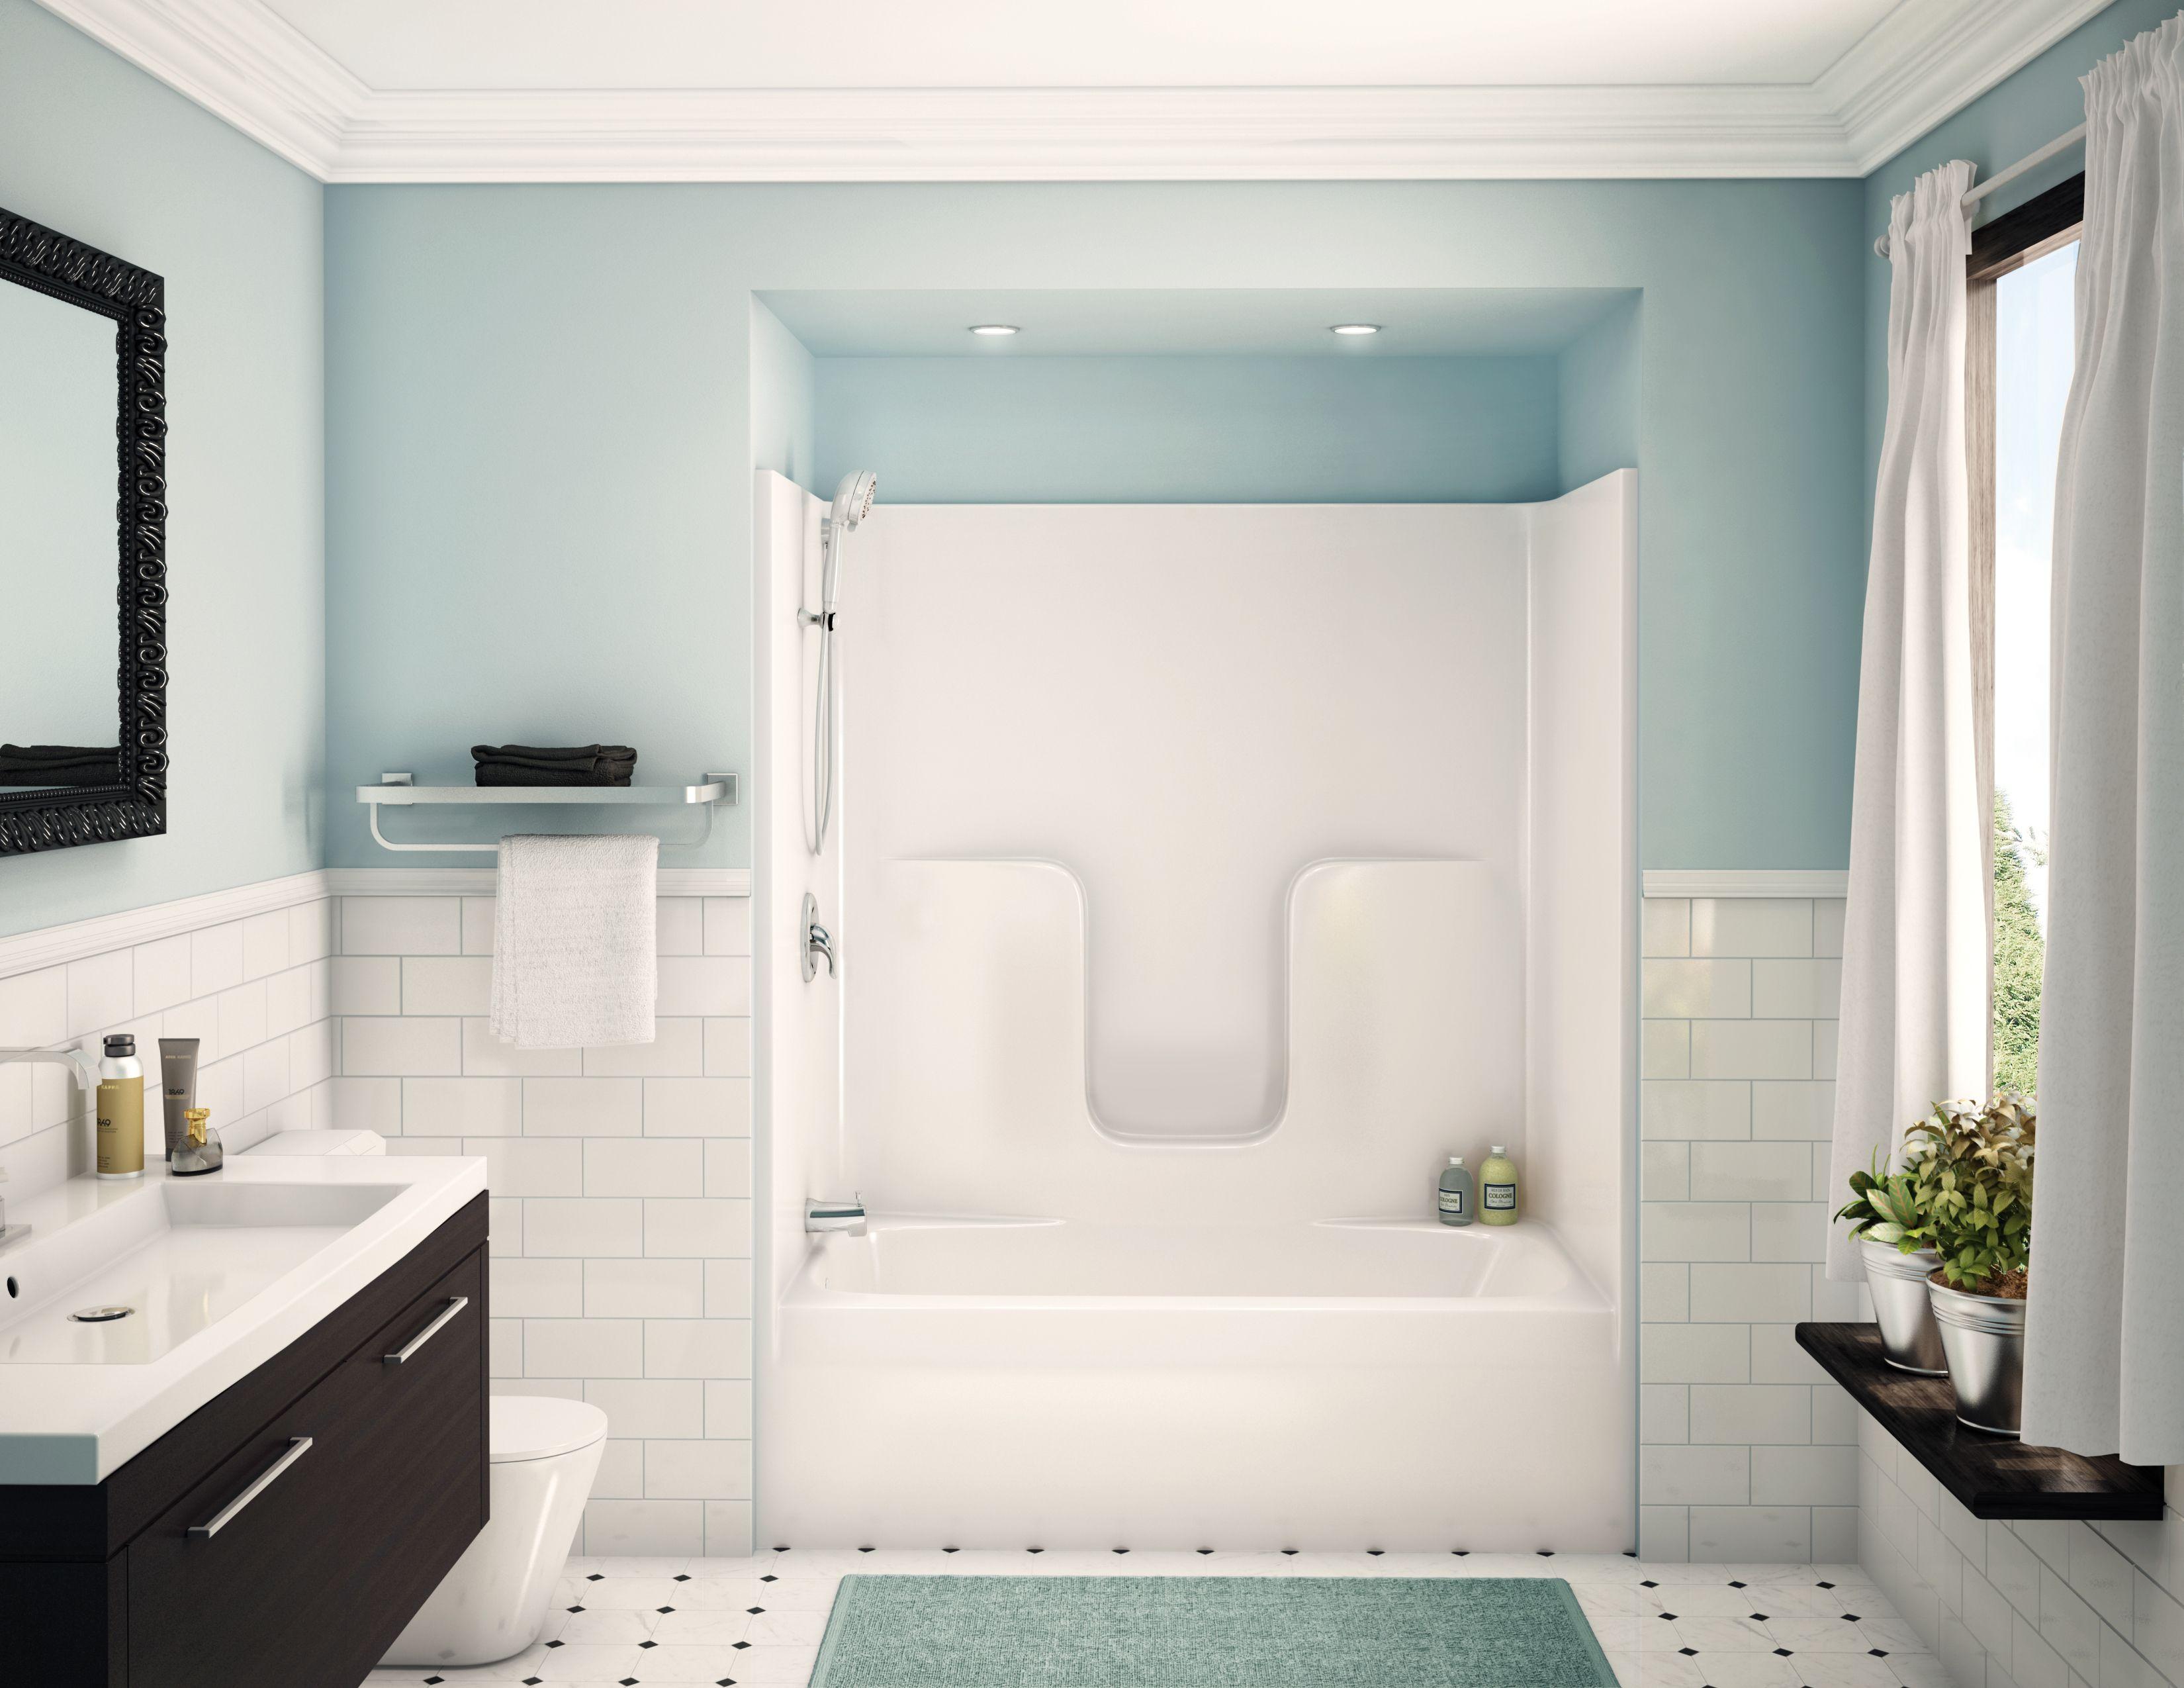 alcove tub showers bathtub aker maax shower doors enclosures and ...